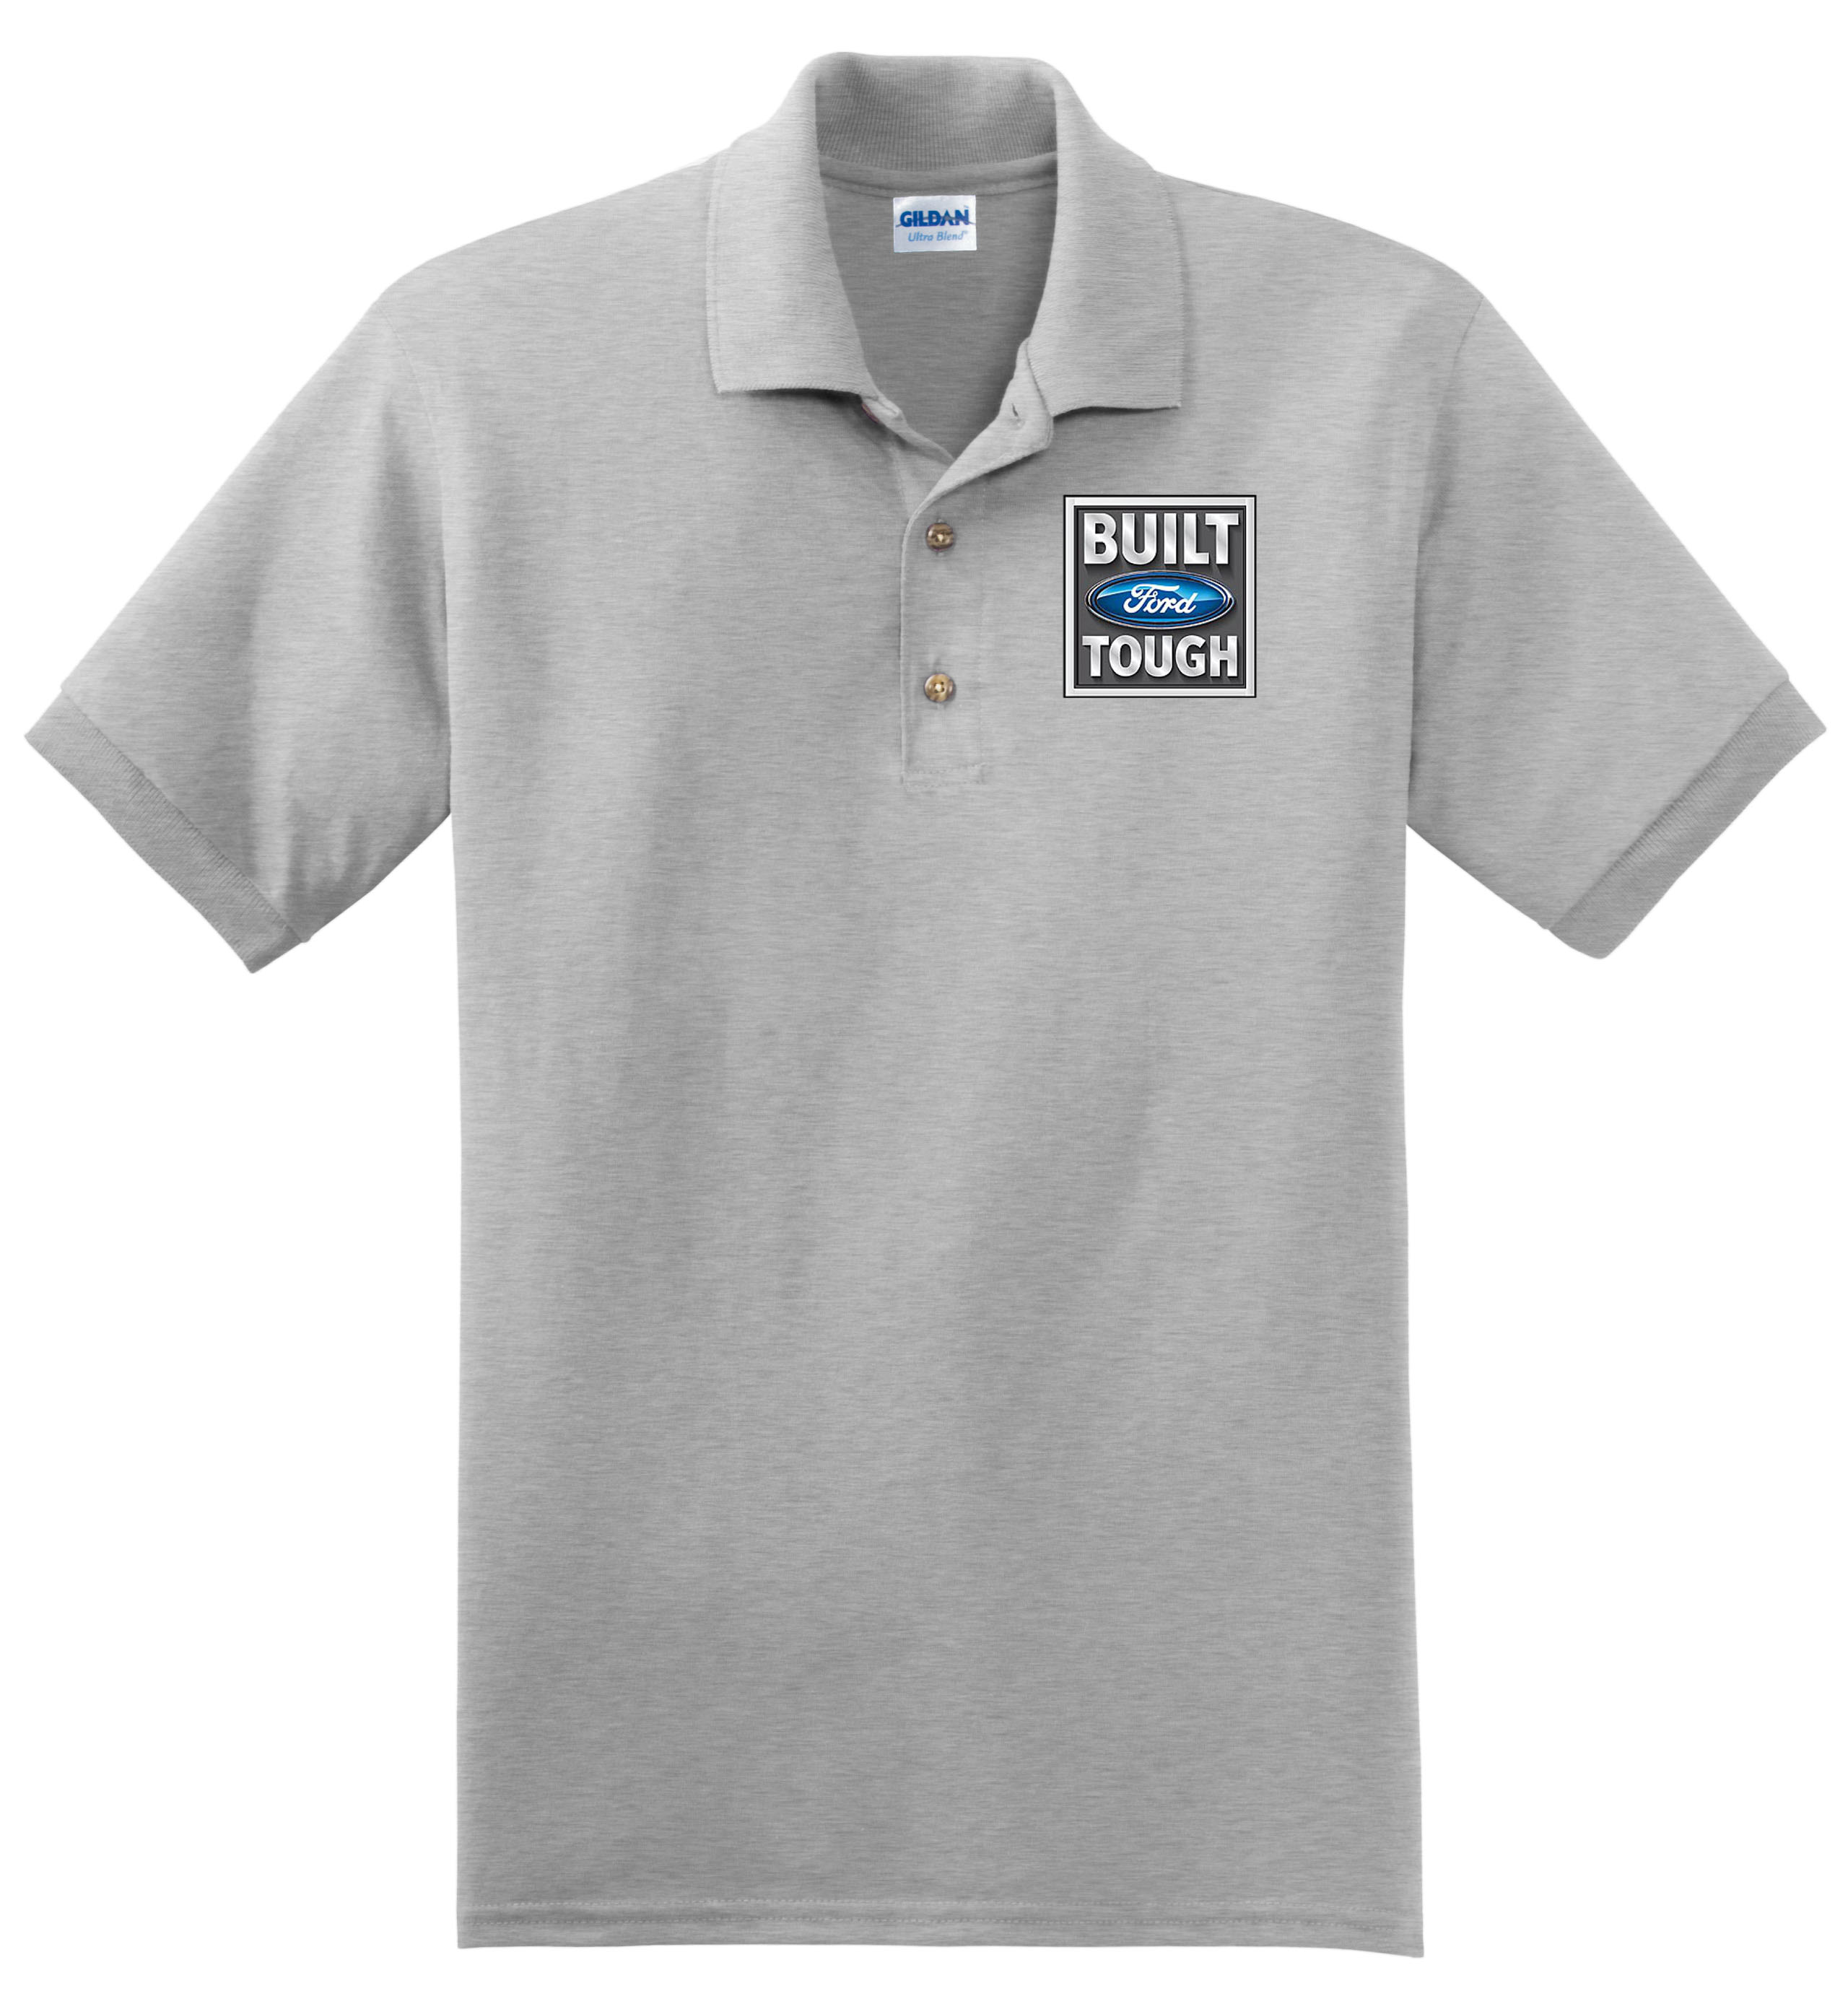 Ford Tough Logo Golf Shirt Polo S-XXXL   eBay